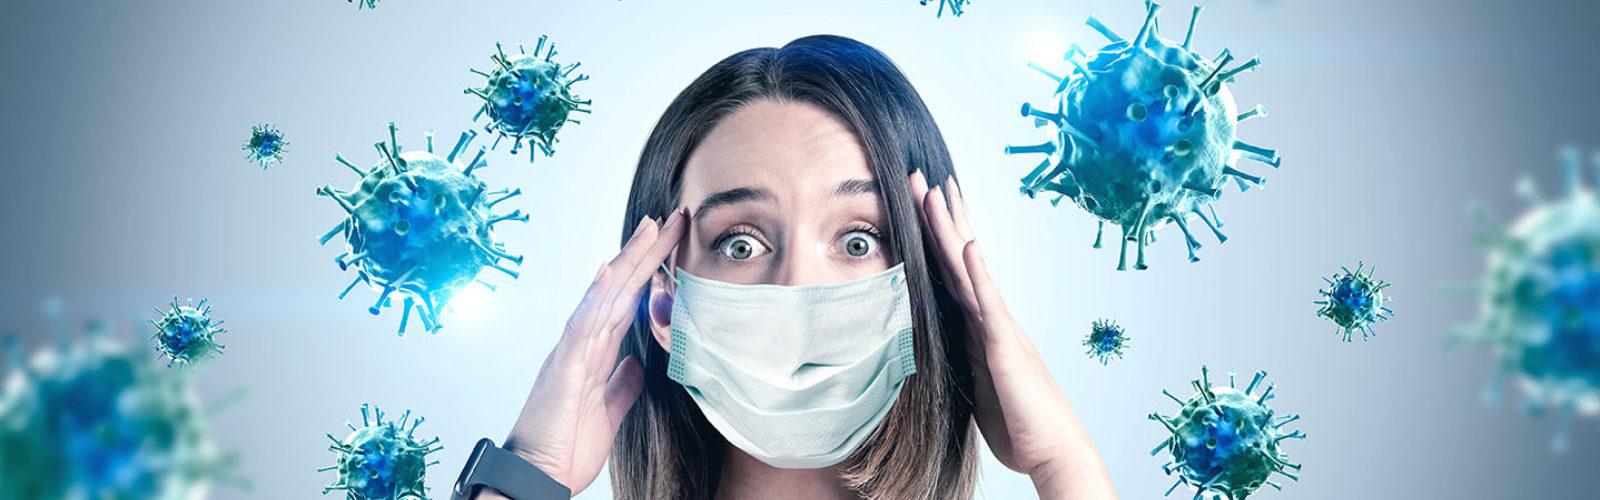 woman scared of coronavirus (350816081)_web.jpg